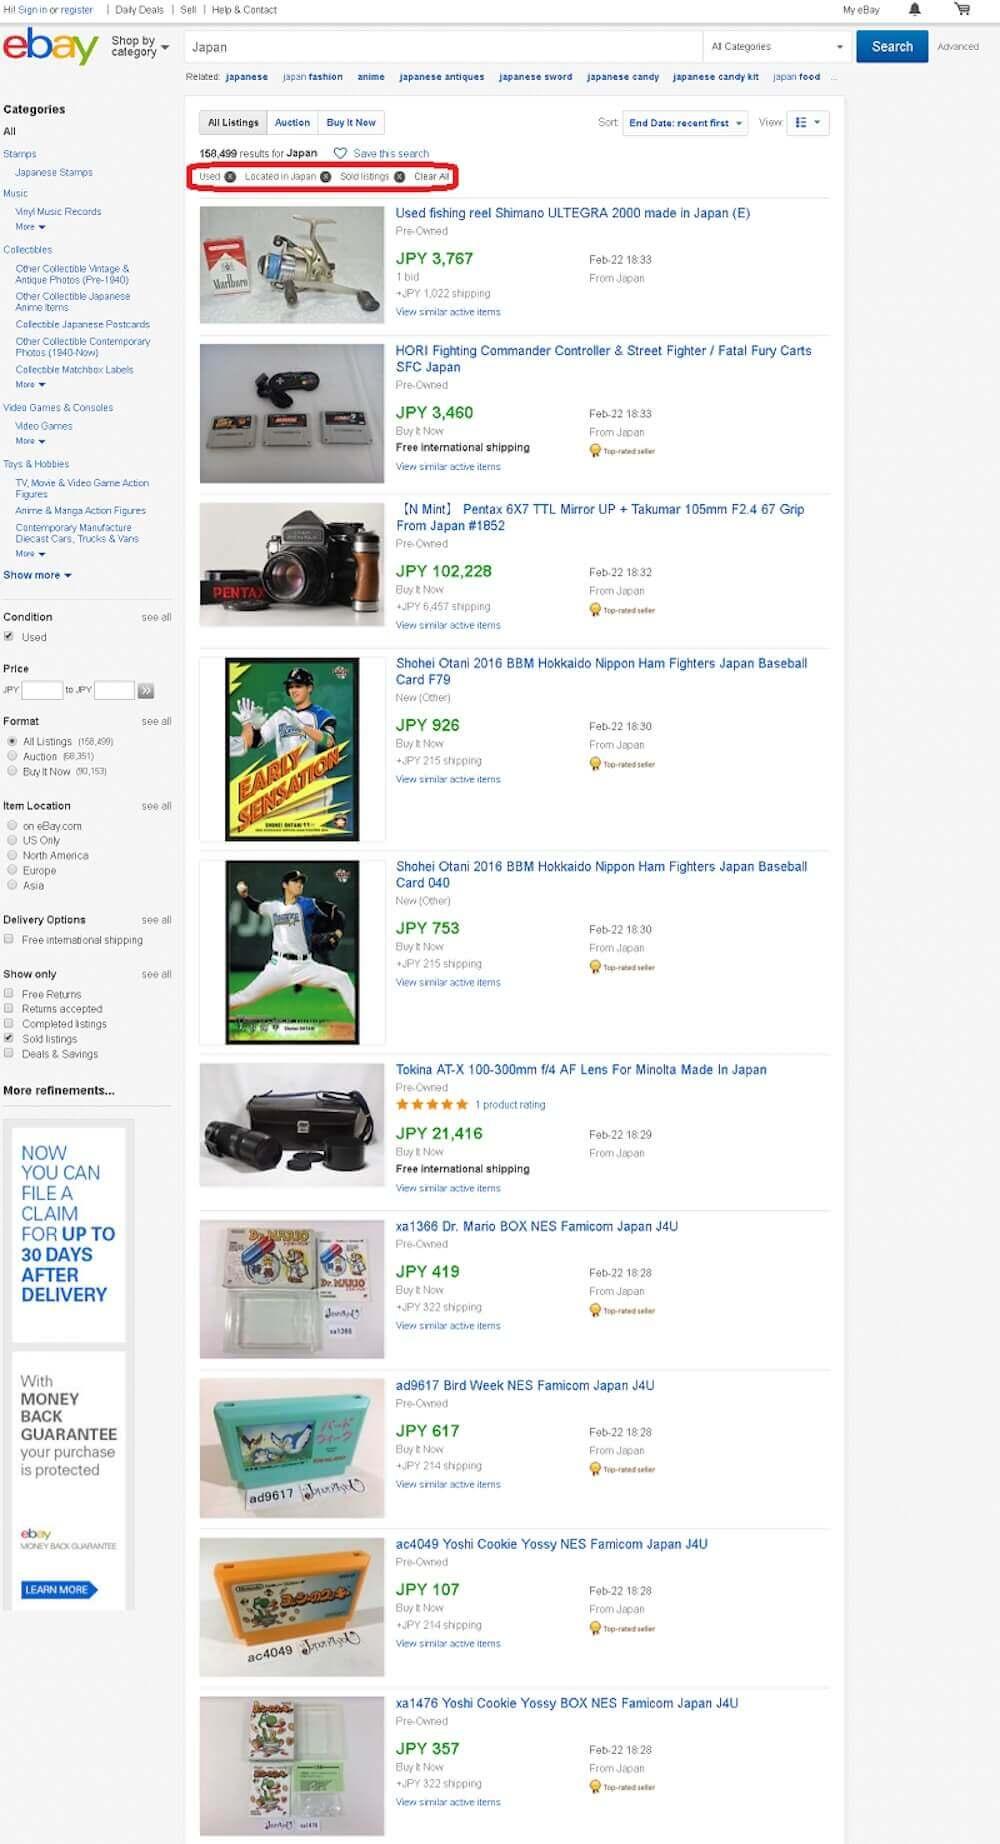 eBay輸出おすすめのリサーチ方法!初心者でも月5万円稼ぐことはかんたん011-2